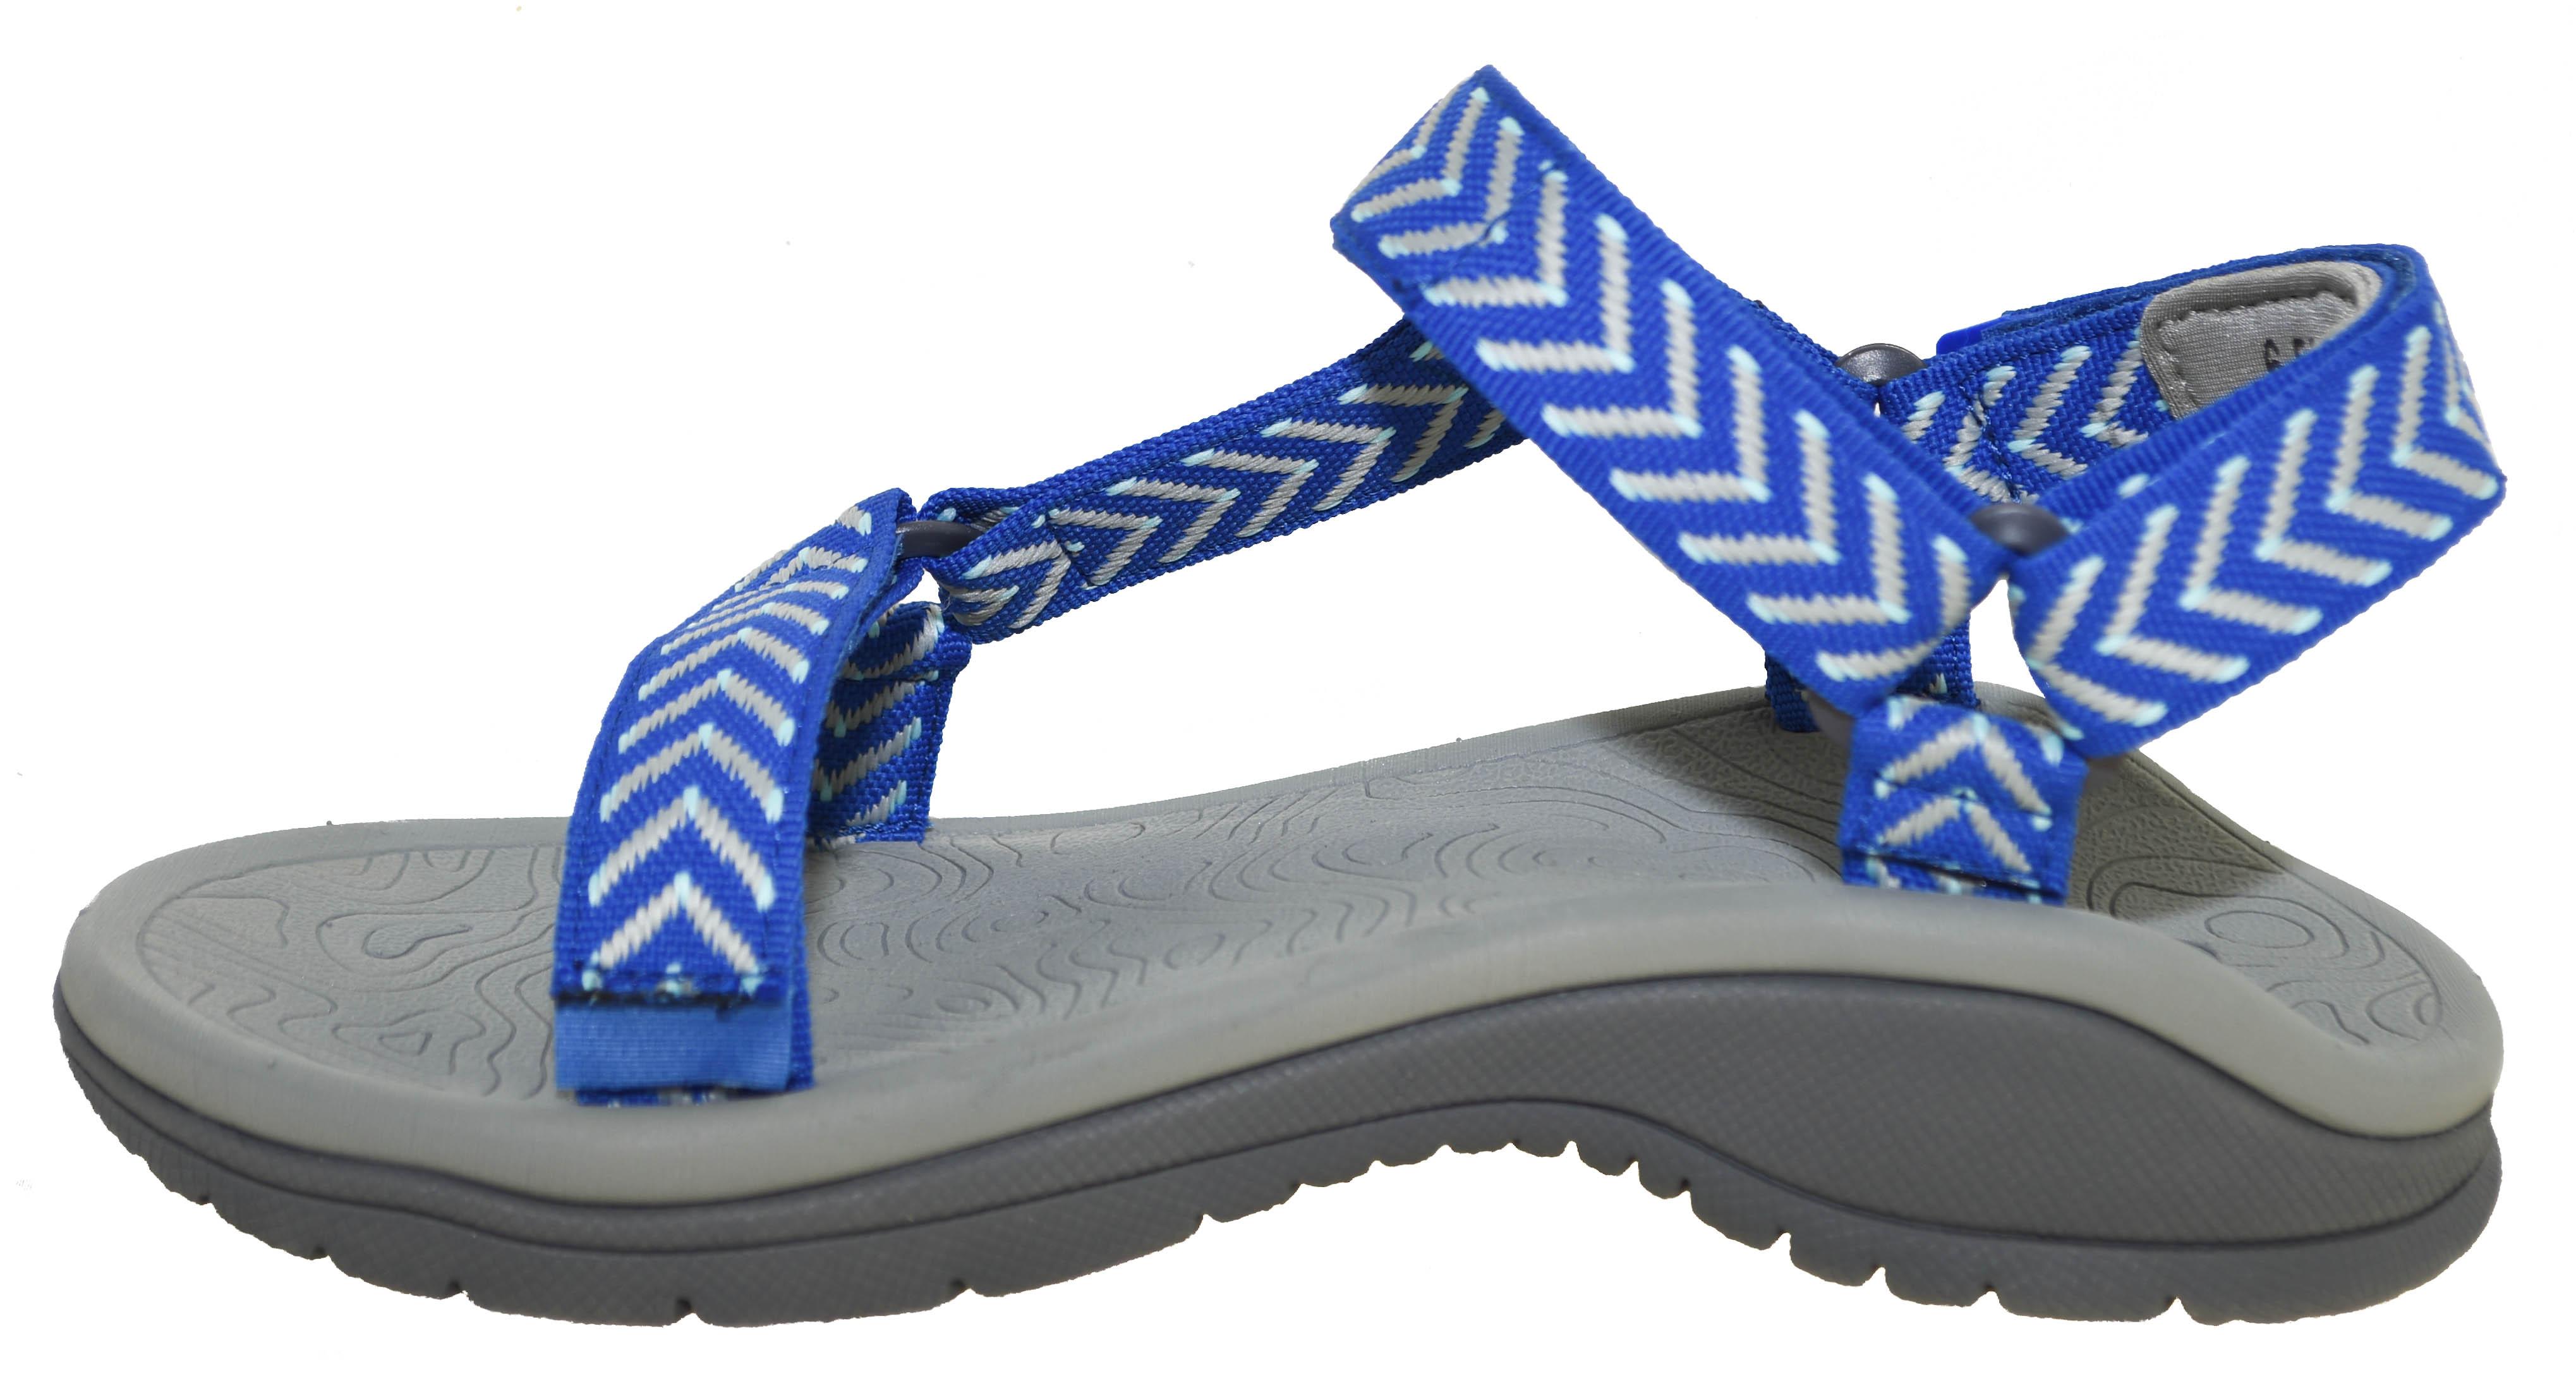 50a5590955059 Details about JSport by Jambu Women's Navajo Vegan Water Ready Sandals Blue